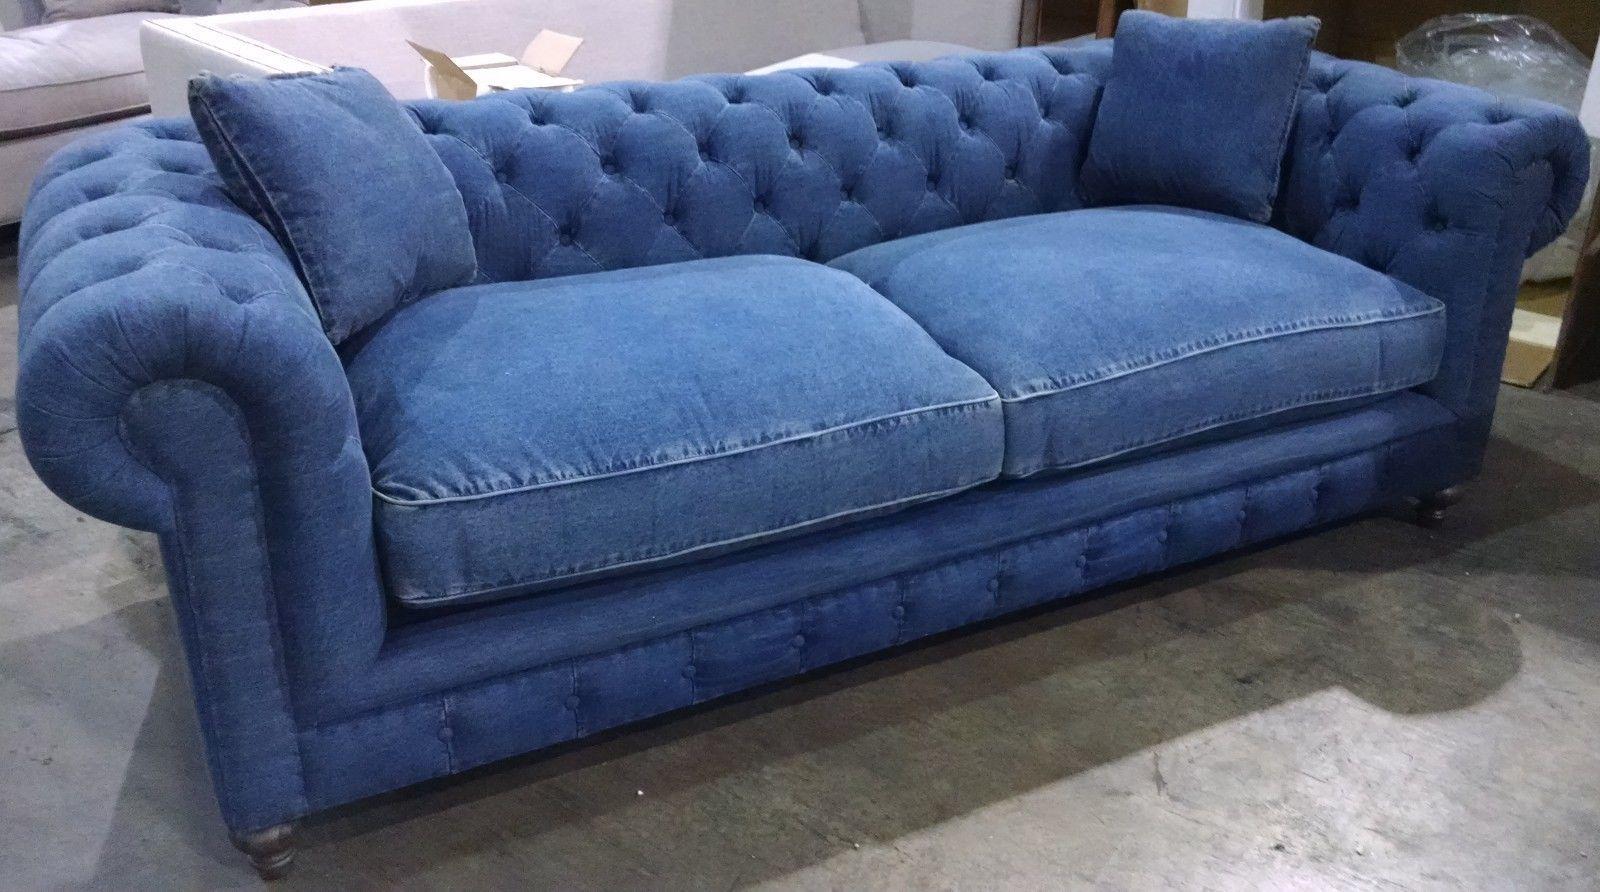 Oxford Sofa 100 Blue Denim Cotton Down Cushions 8 Way Hand Tied Nice